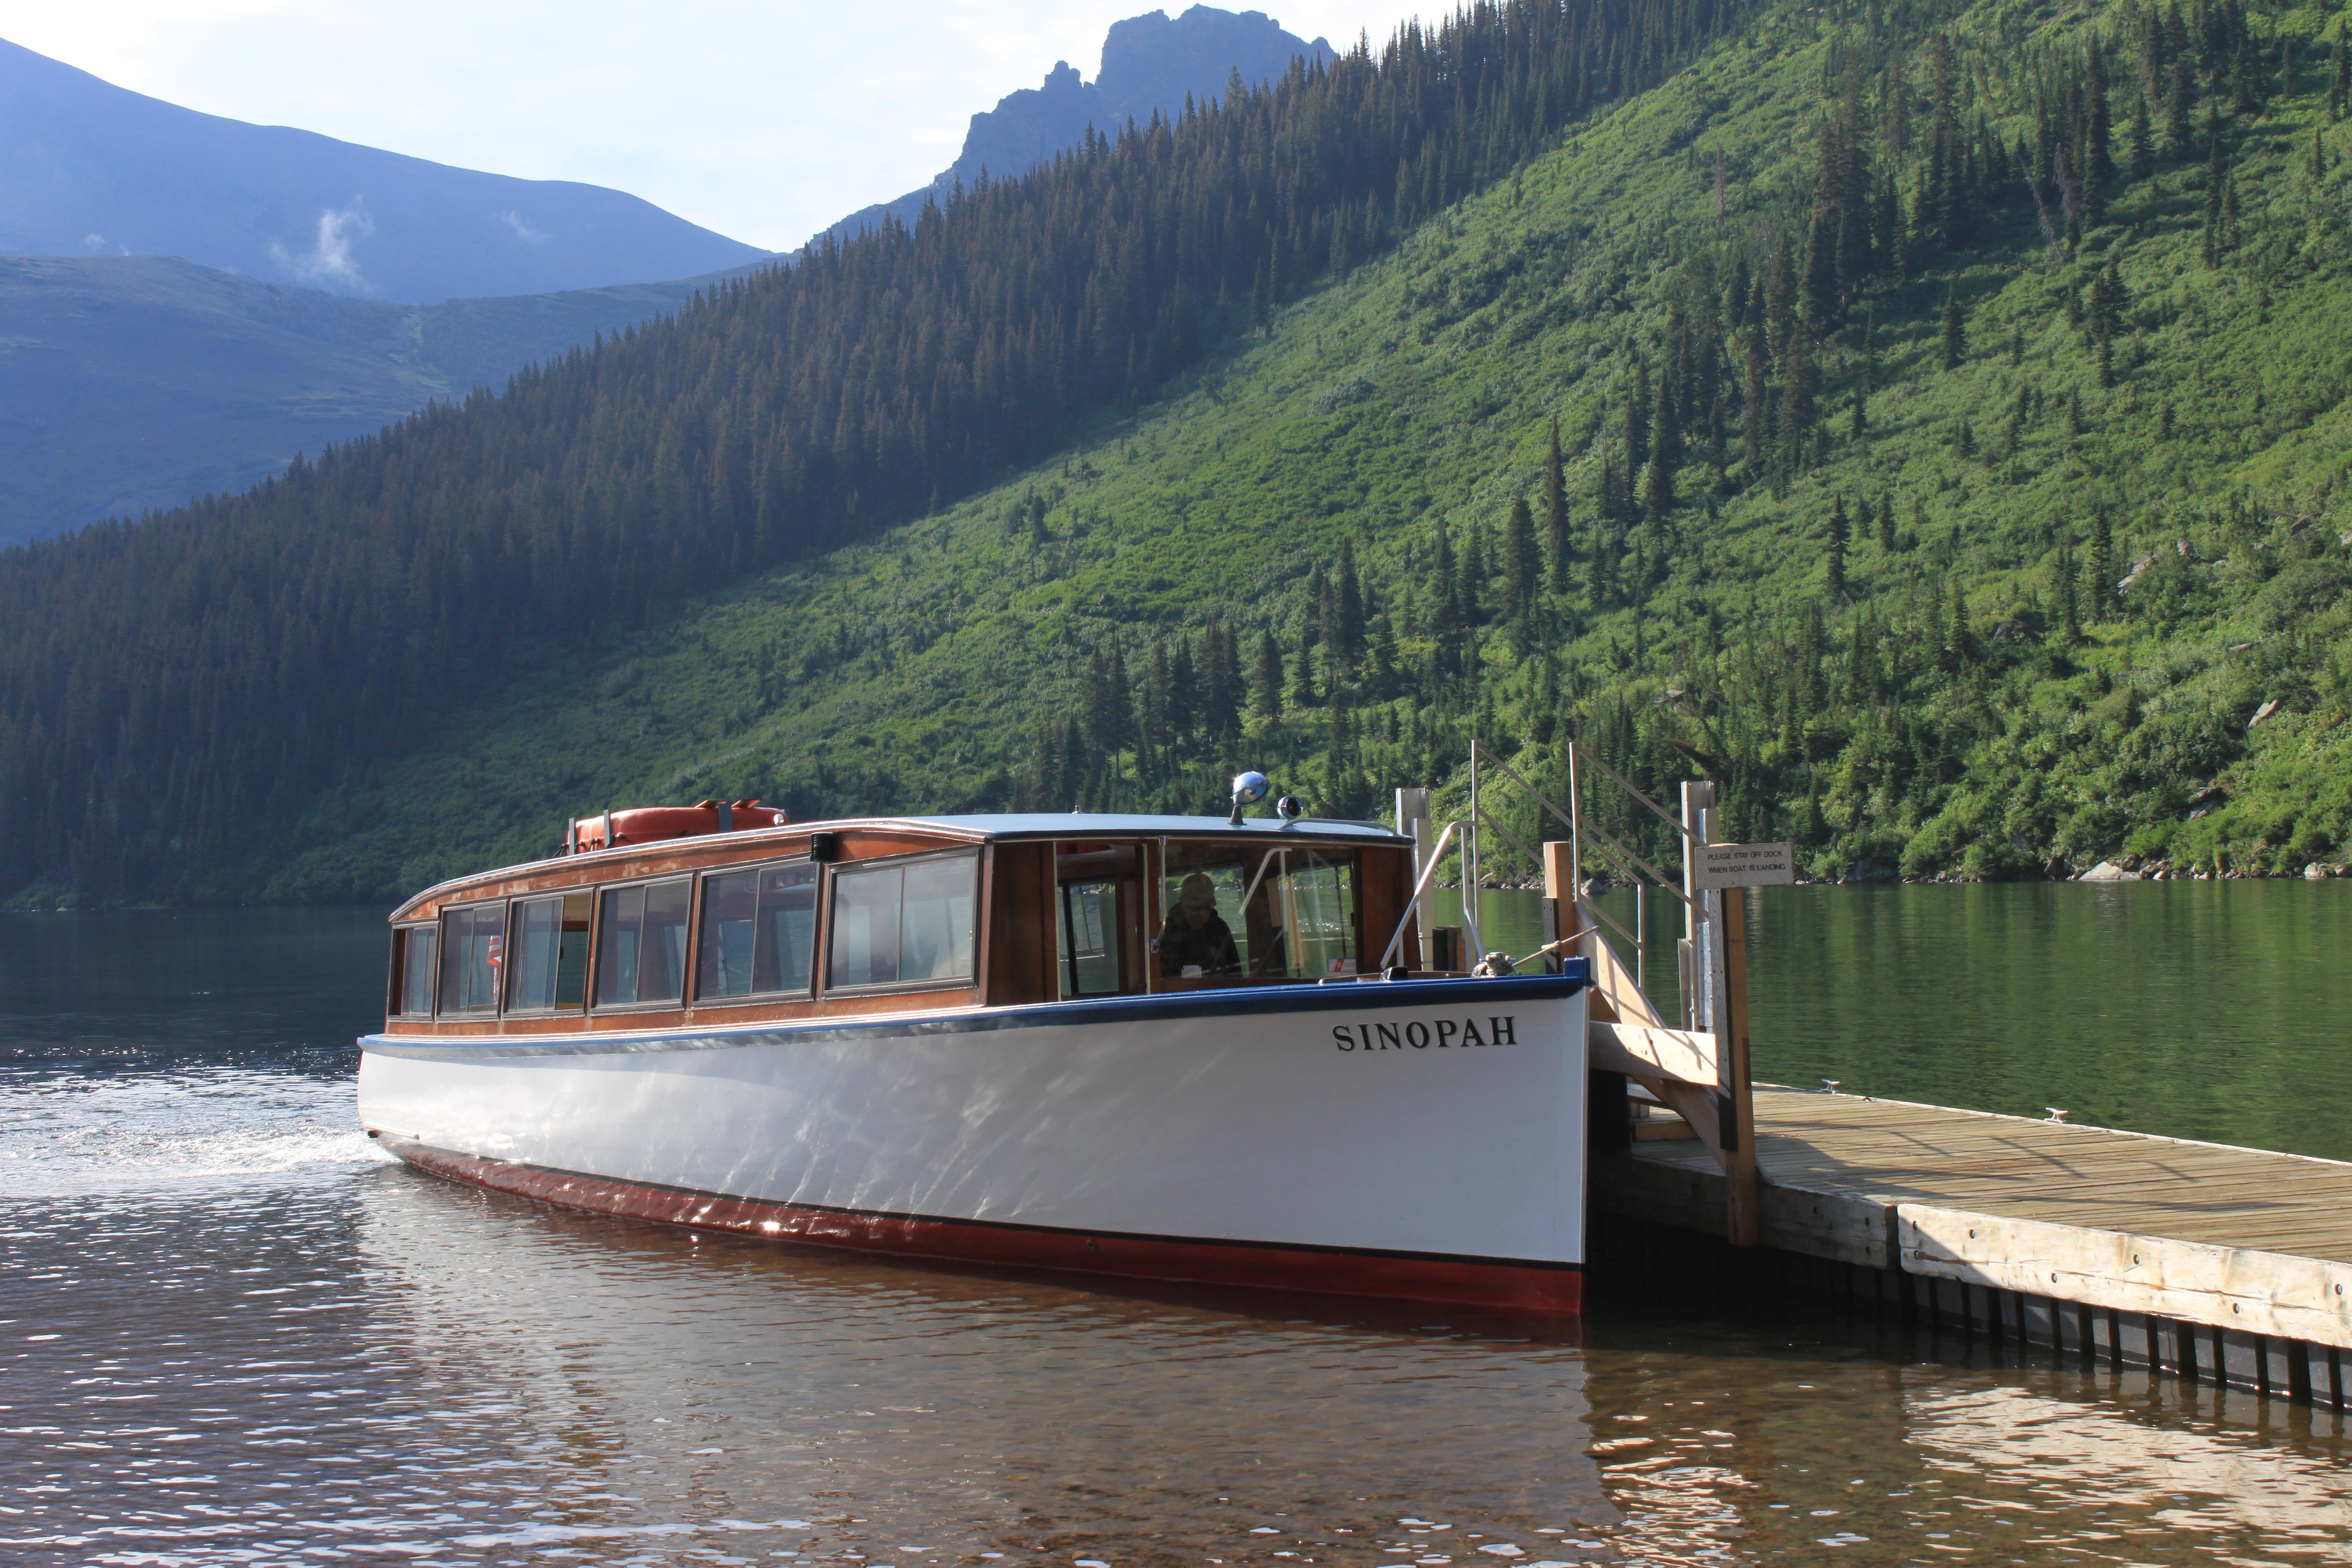 Historic tour boat Sinopah on Two Medicine Lake, Glacier National Park, Montana. Photo taken on August 1, 2014.